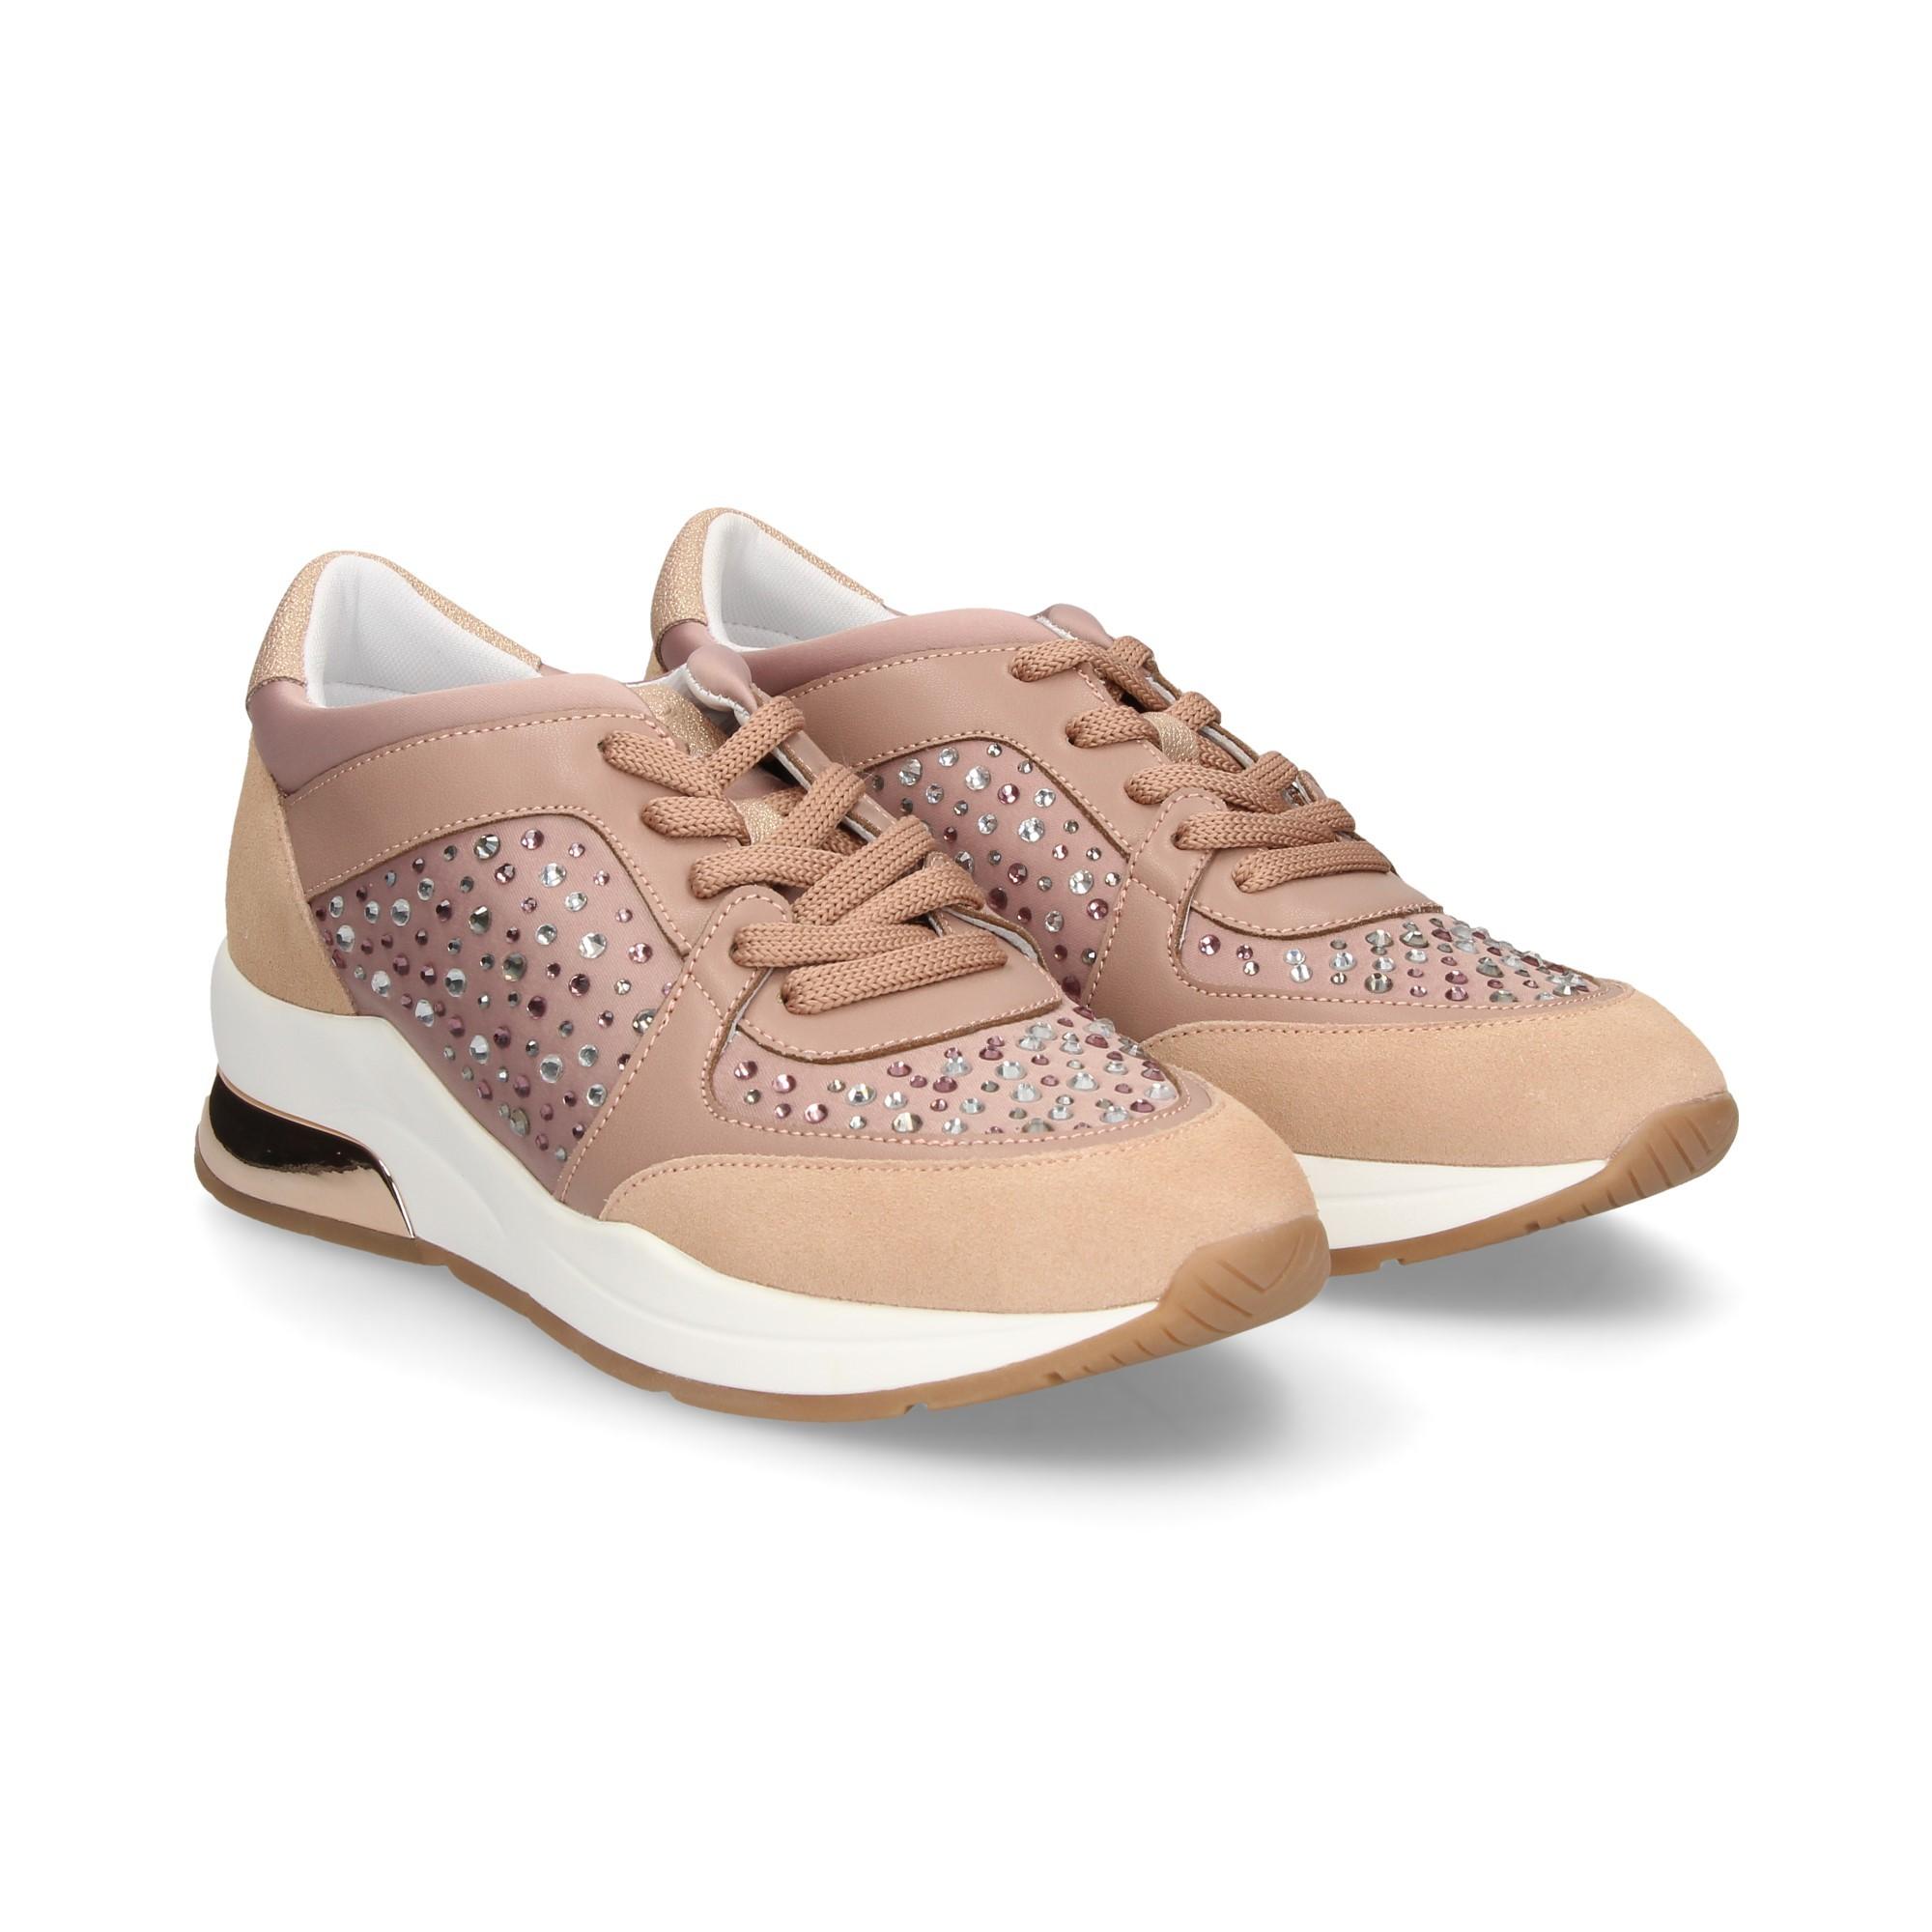 2c4073eef3 LIU·JO Sapatos de senhora B19007 TX003 00006 PINK